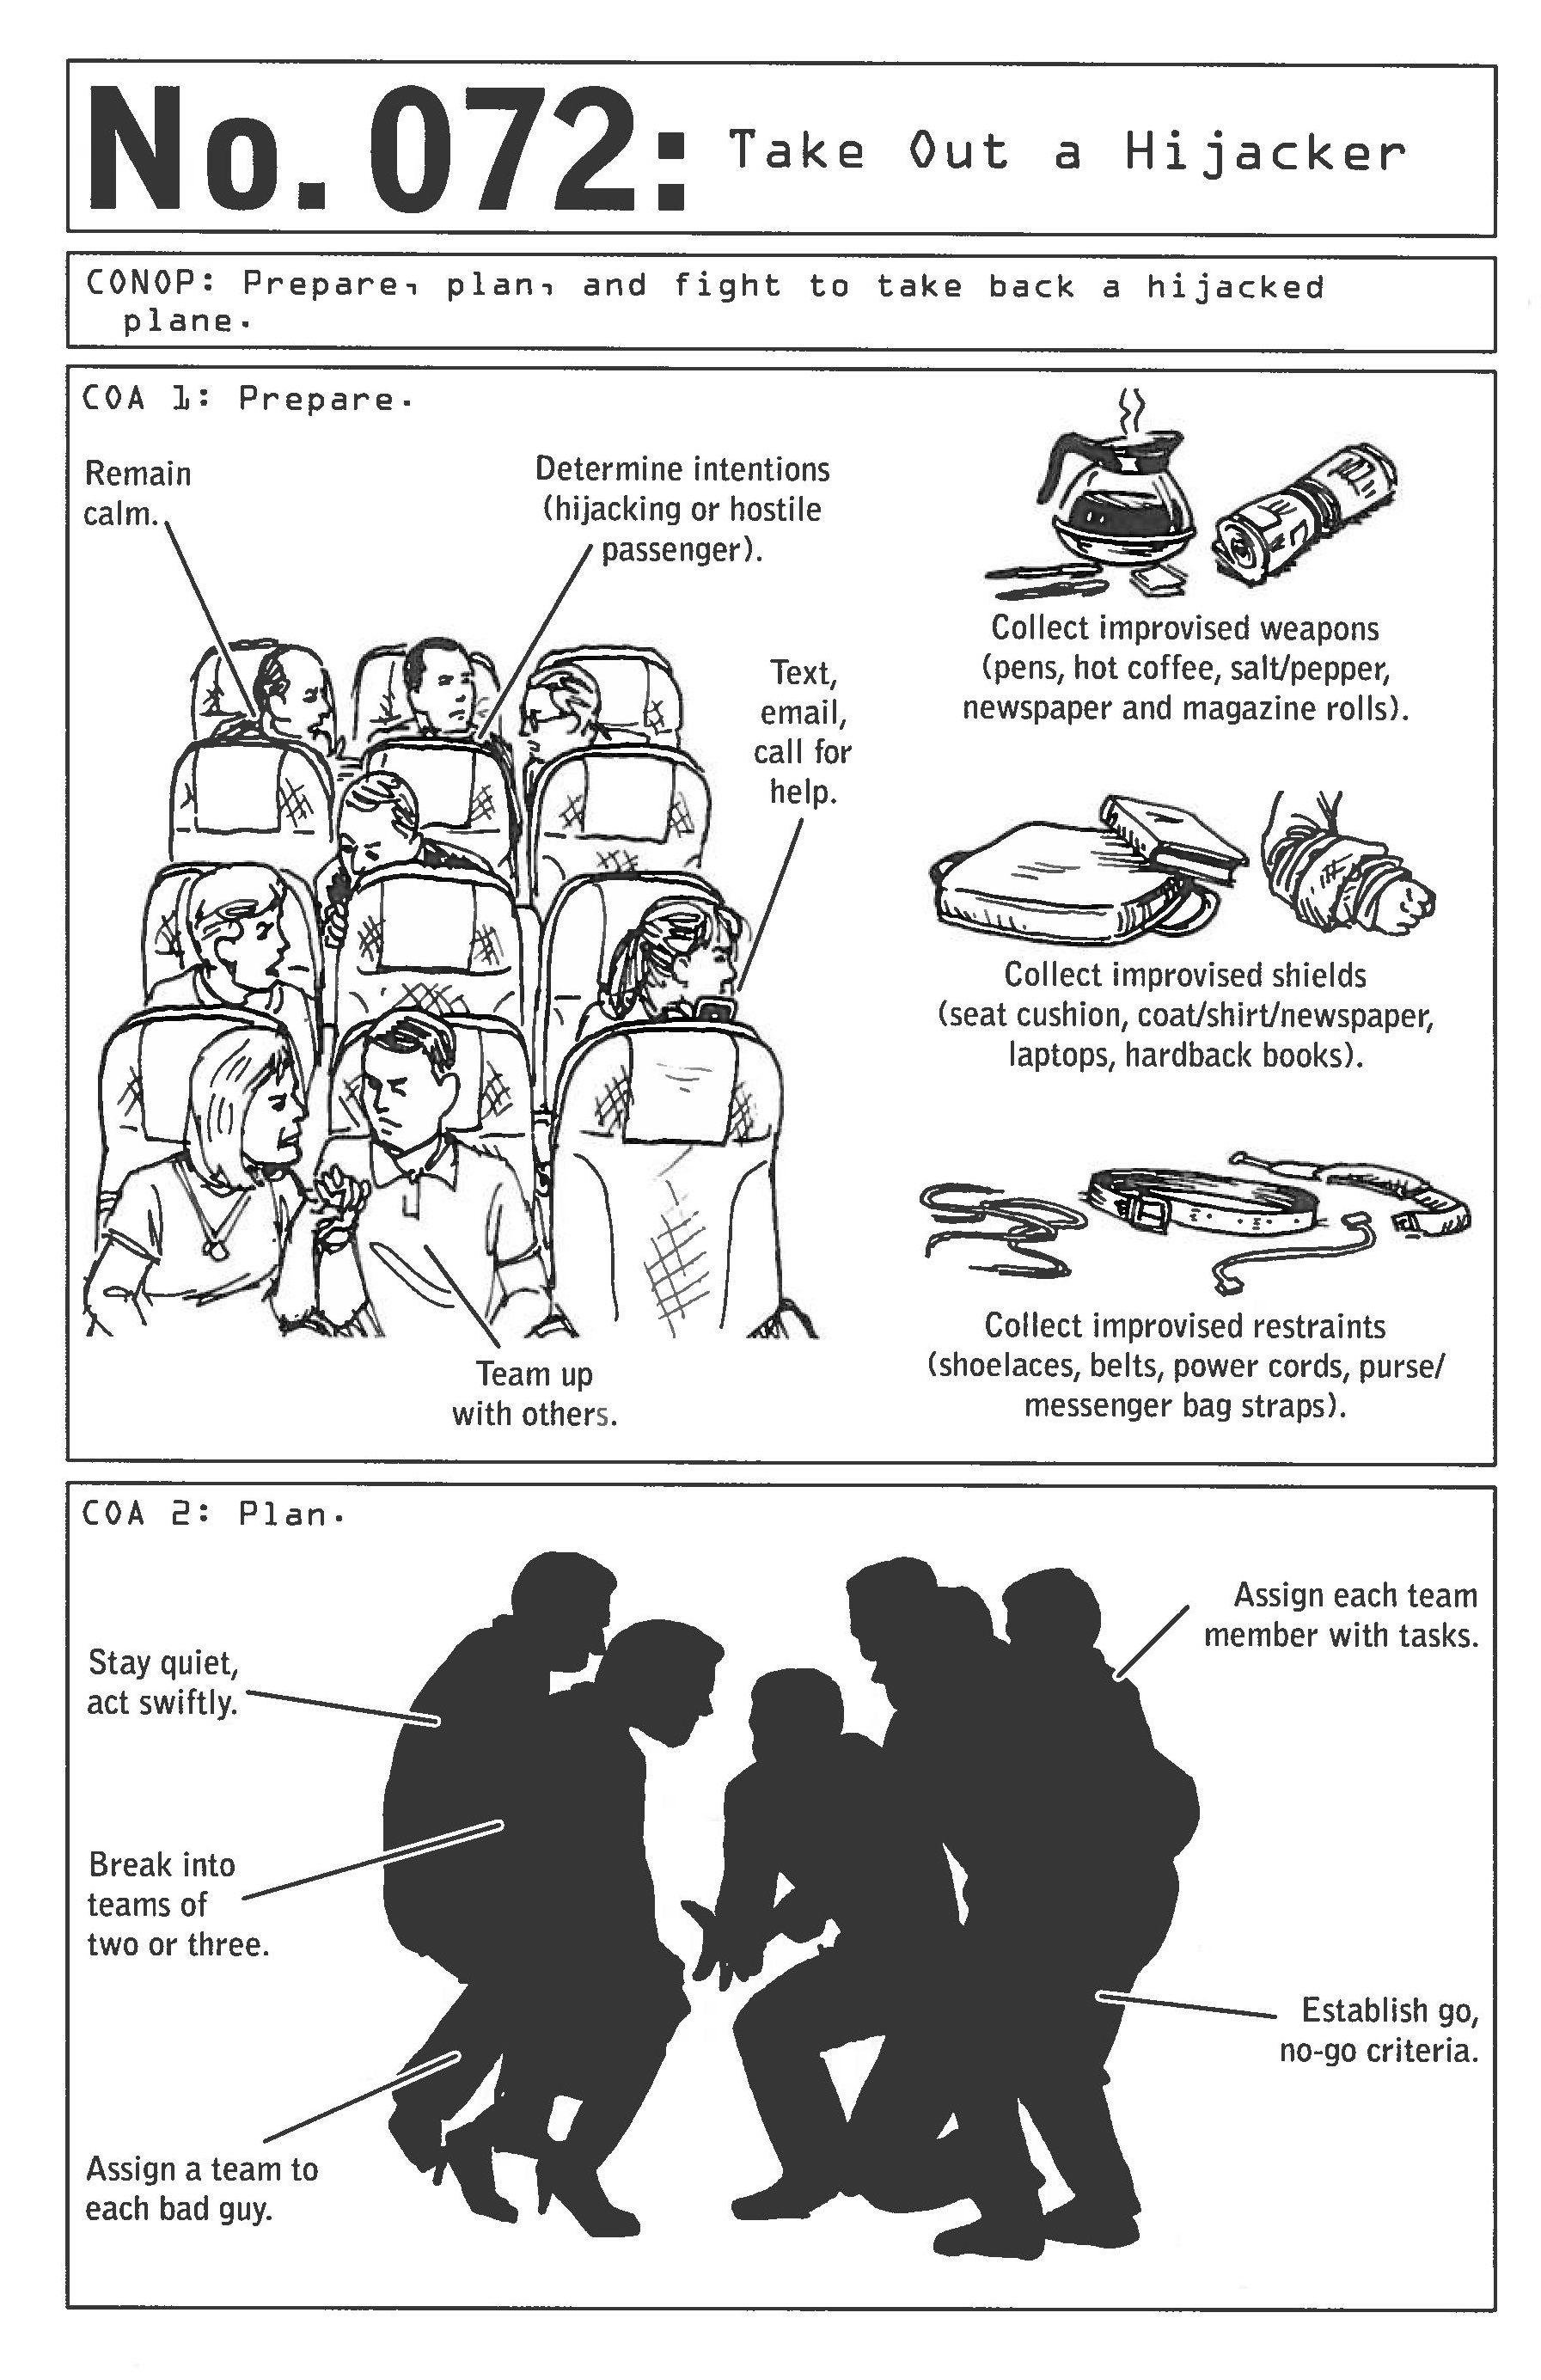 100 deadly skills skill 72 take out a hijacker survive 100 deadly skills skill 72 take out a hijacker